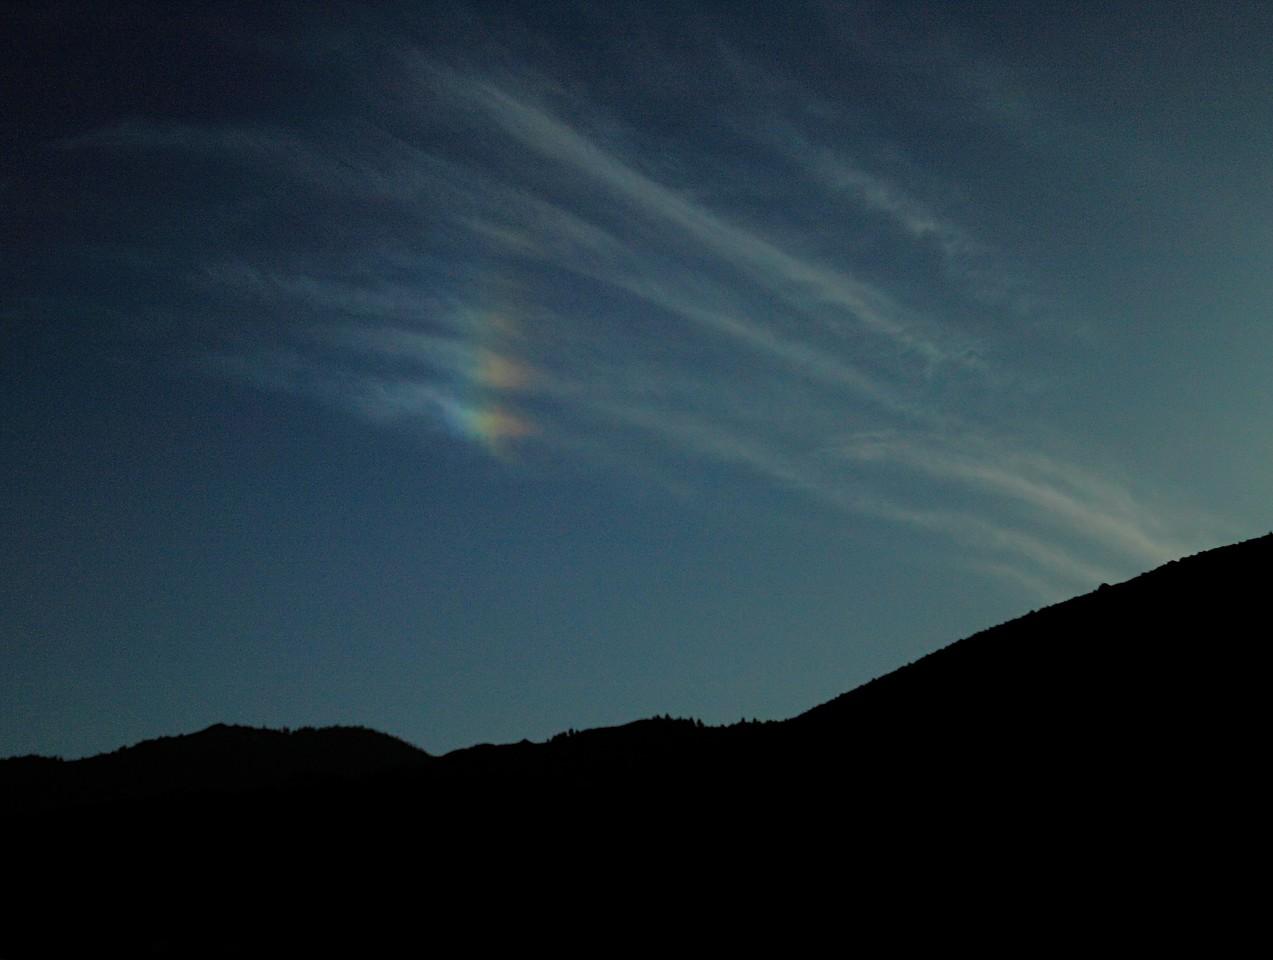 3-Intermediate-Open-DNP-Tim_Peterson-Sun_Dog_Clouds